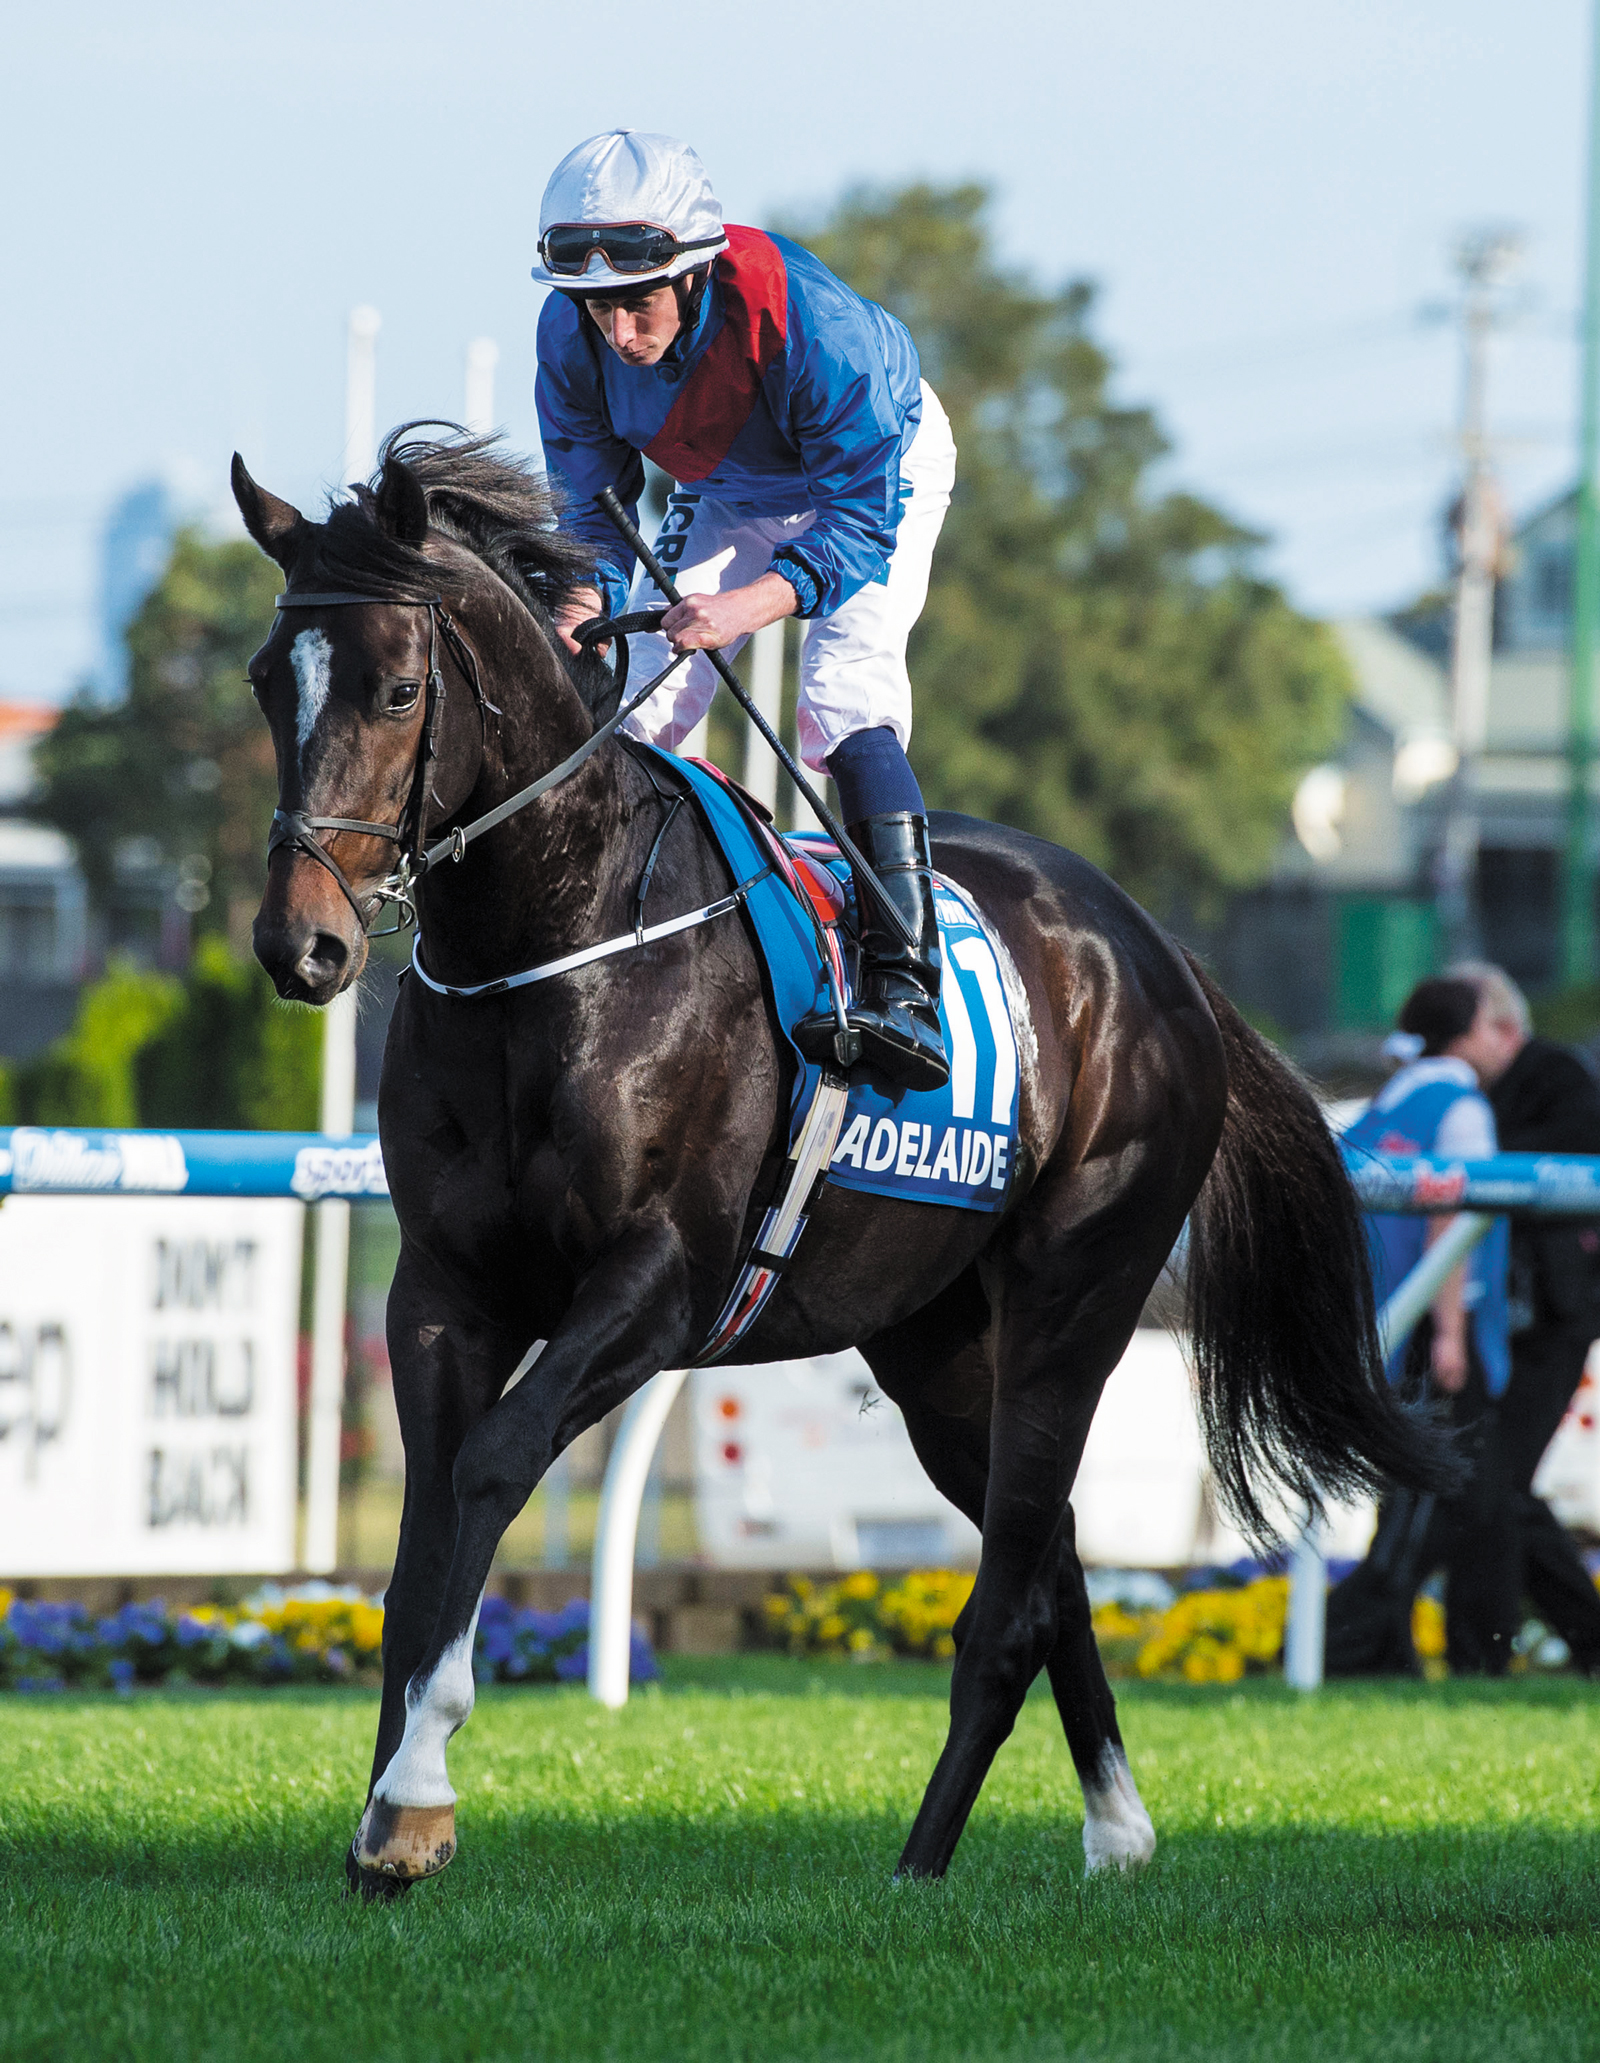 https://www.stallions.com.au/wp-content/uploads/2019/09/Adelaide.jpg